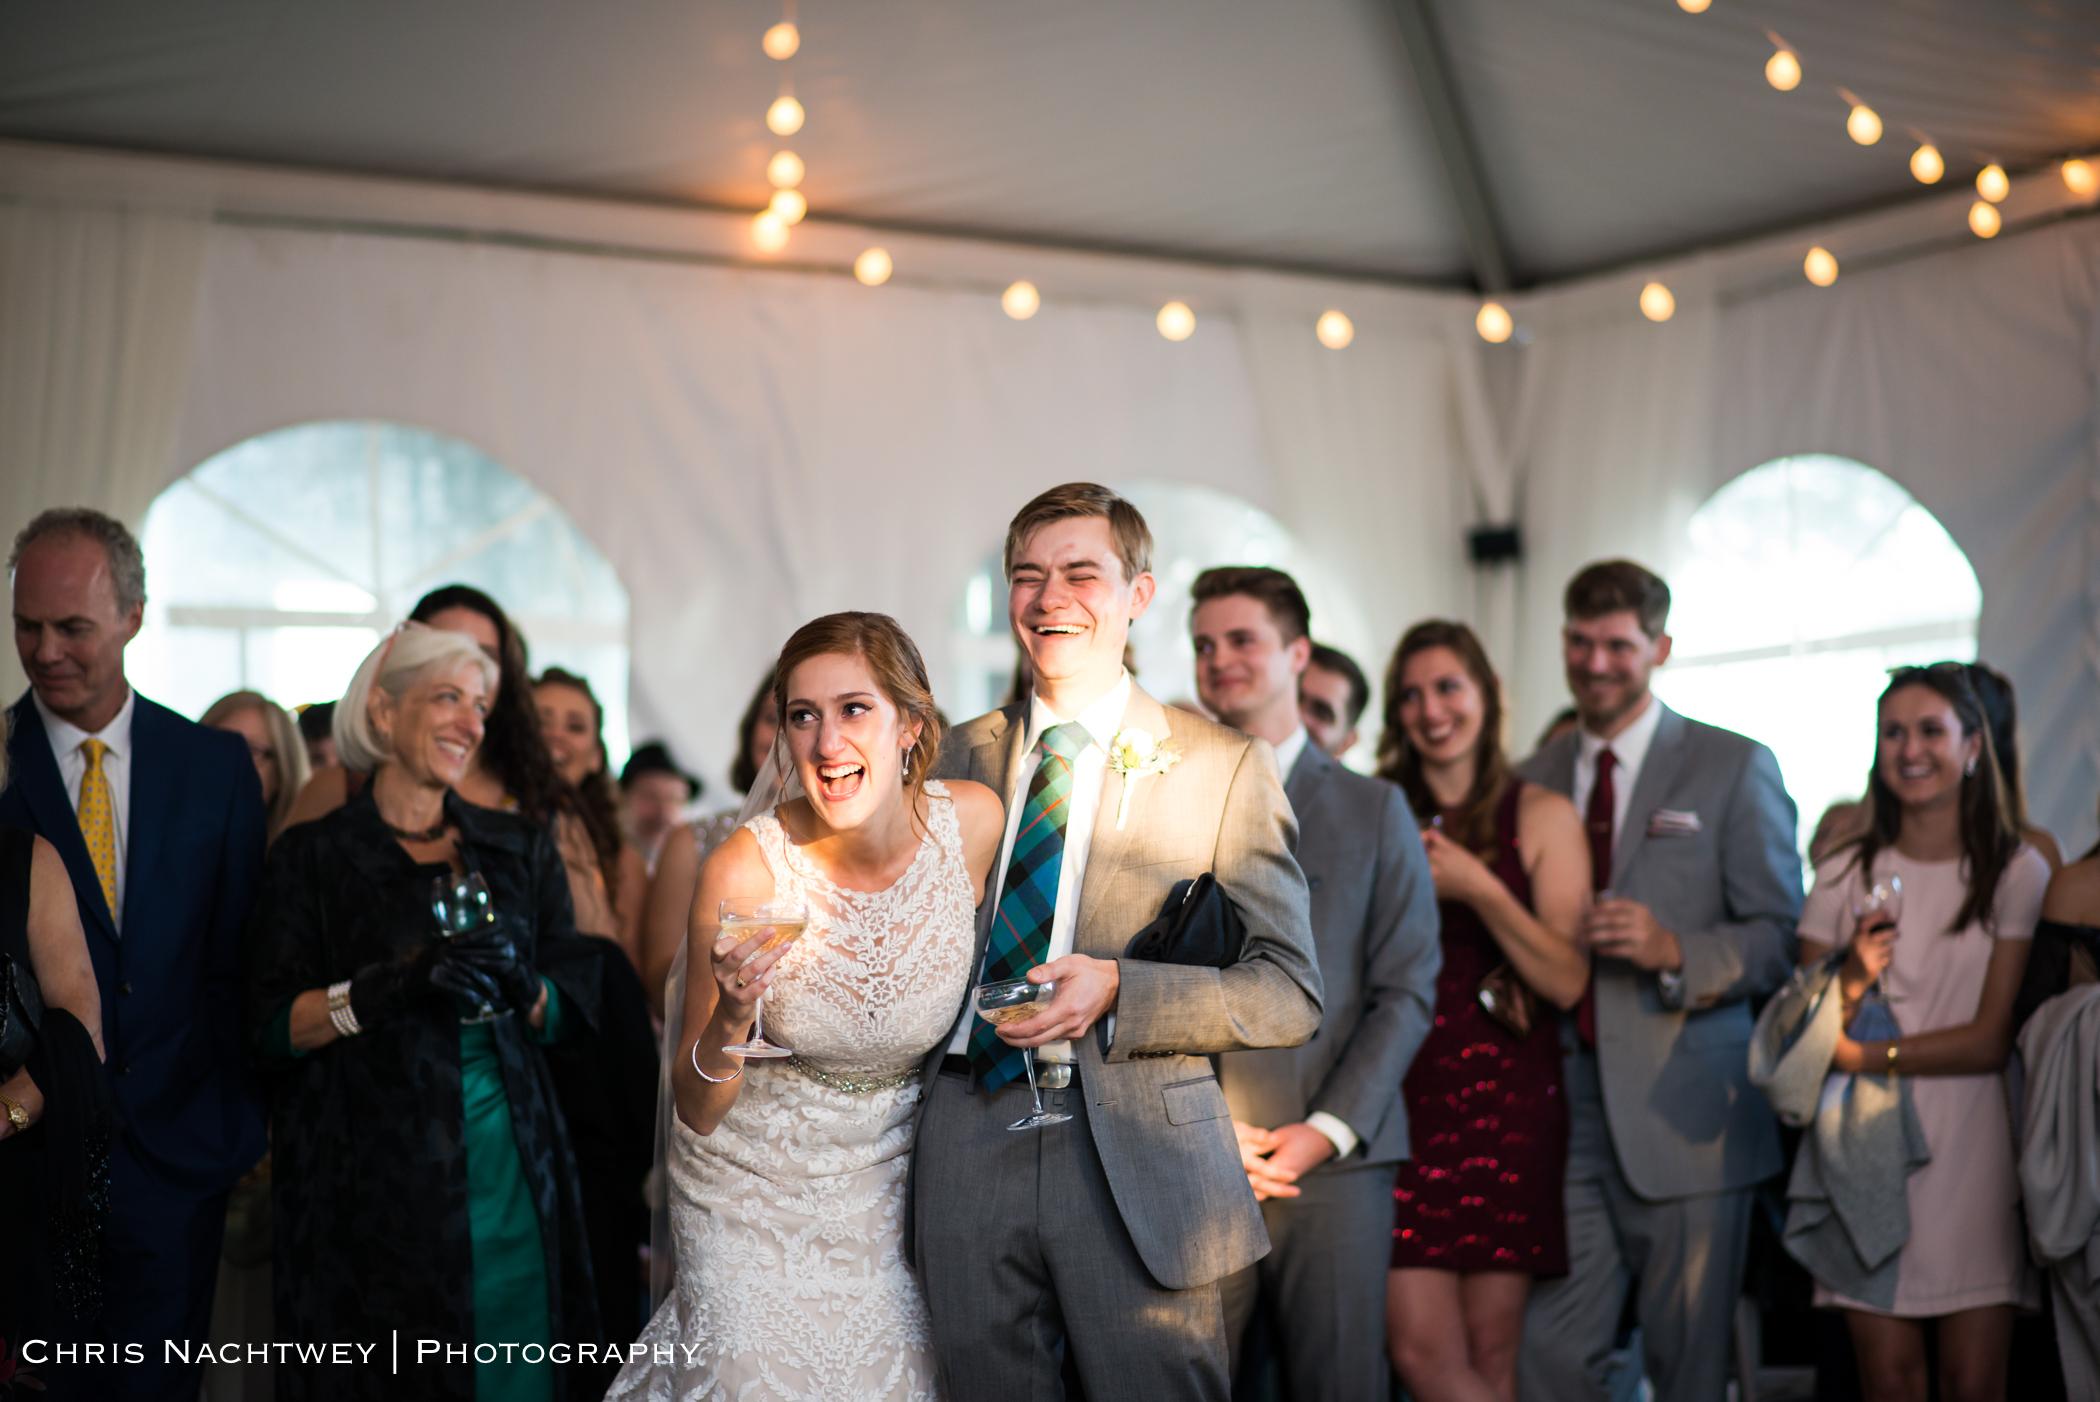 harkness-wedding-photos-chris-nachtwey-photography-2018-30.jpg